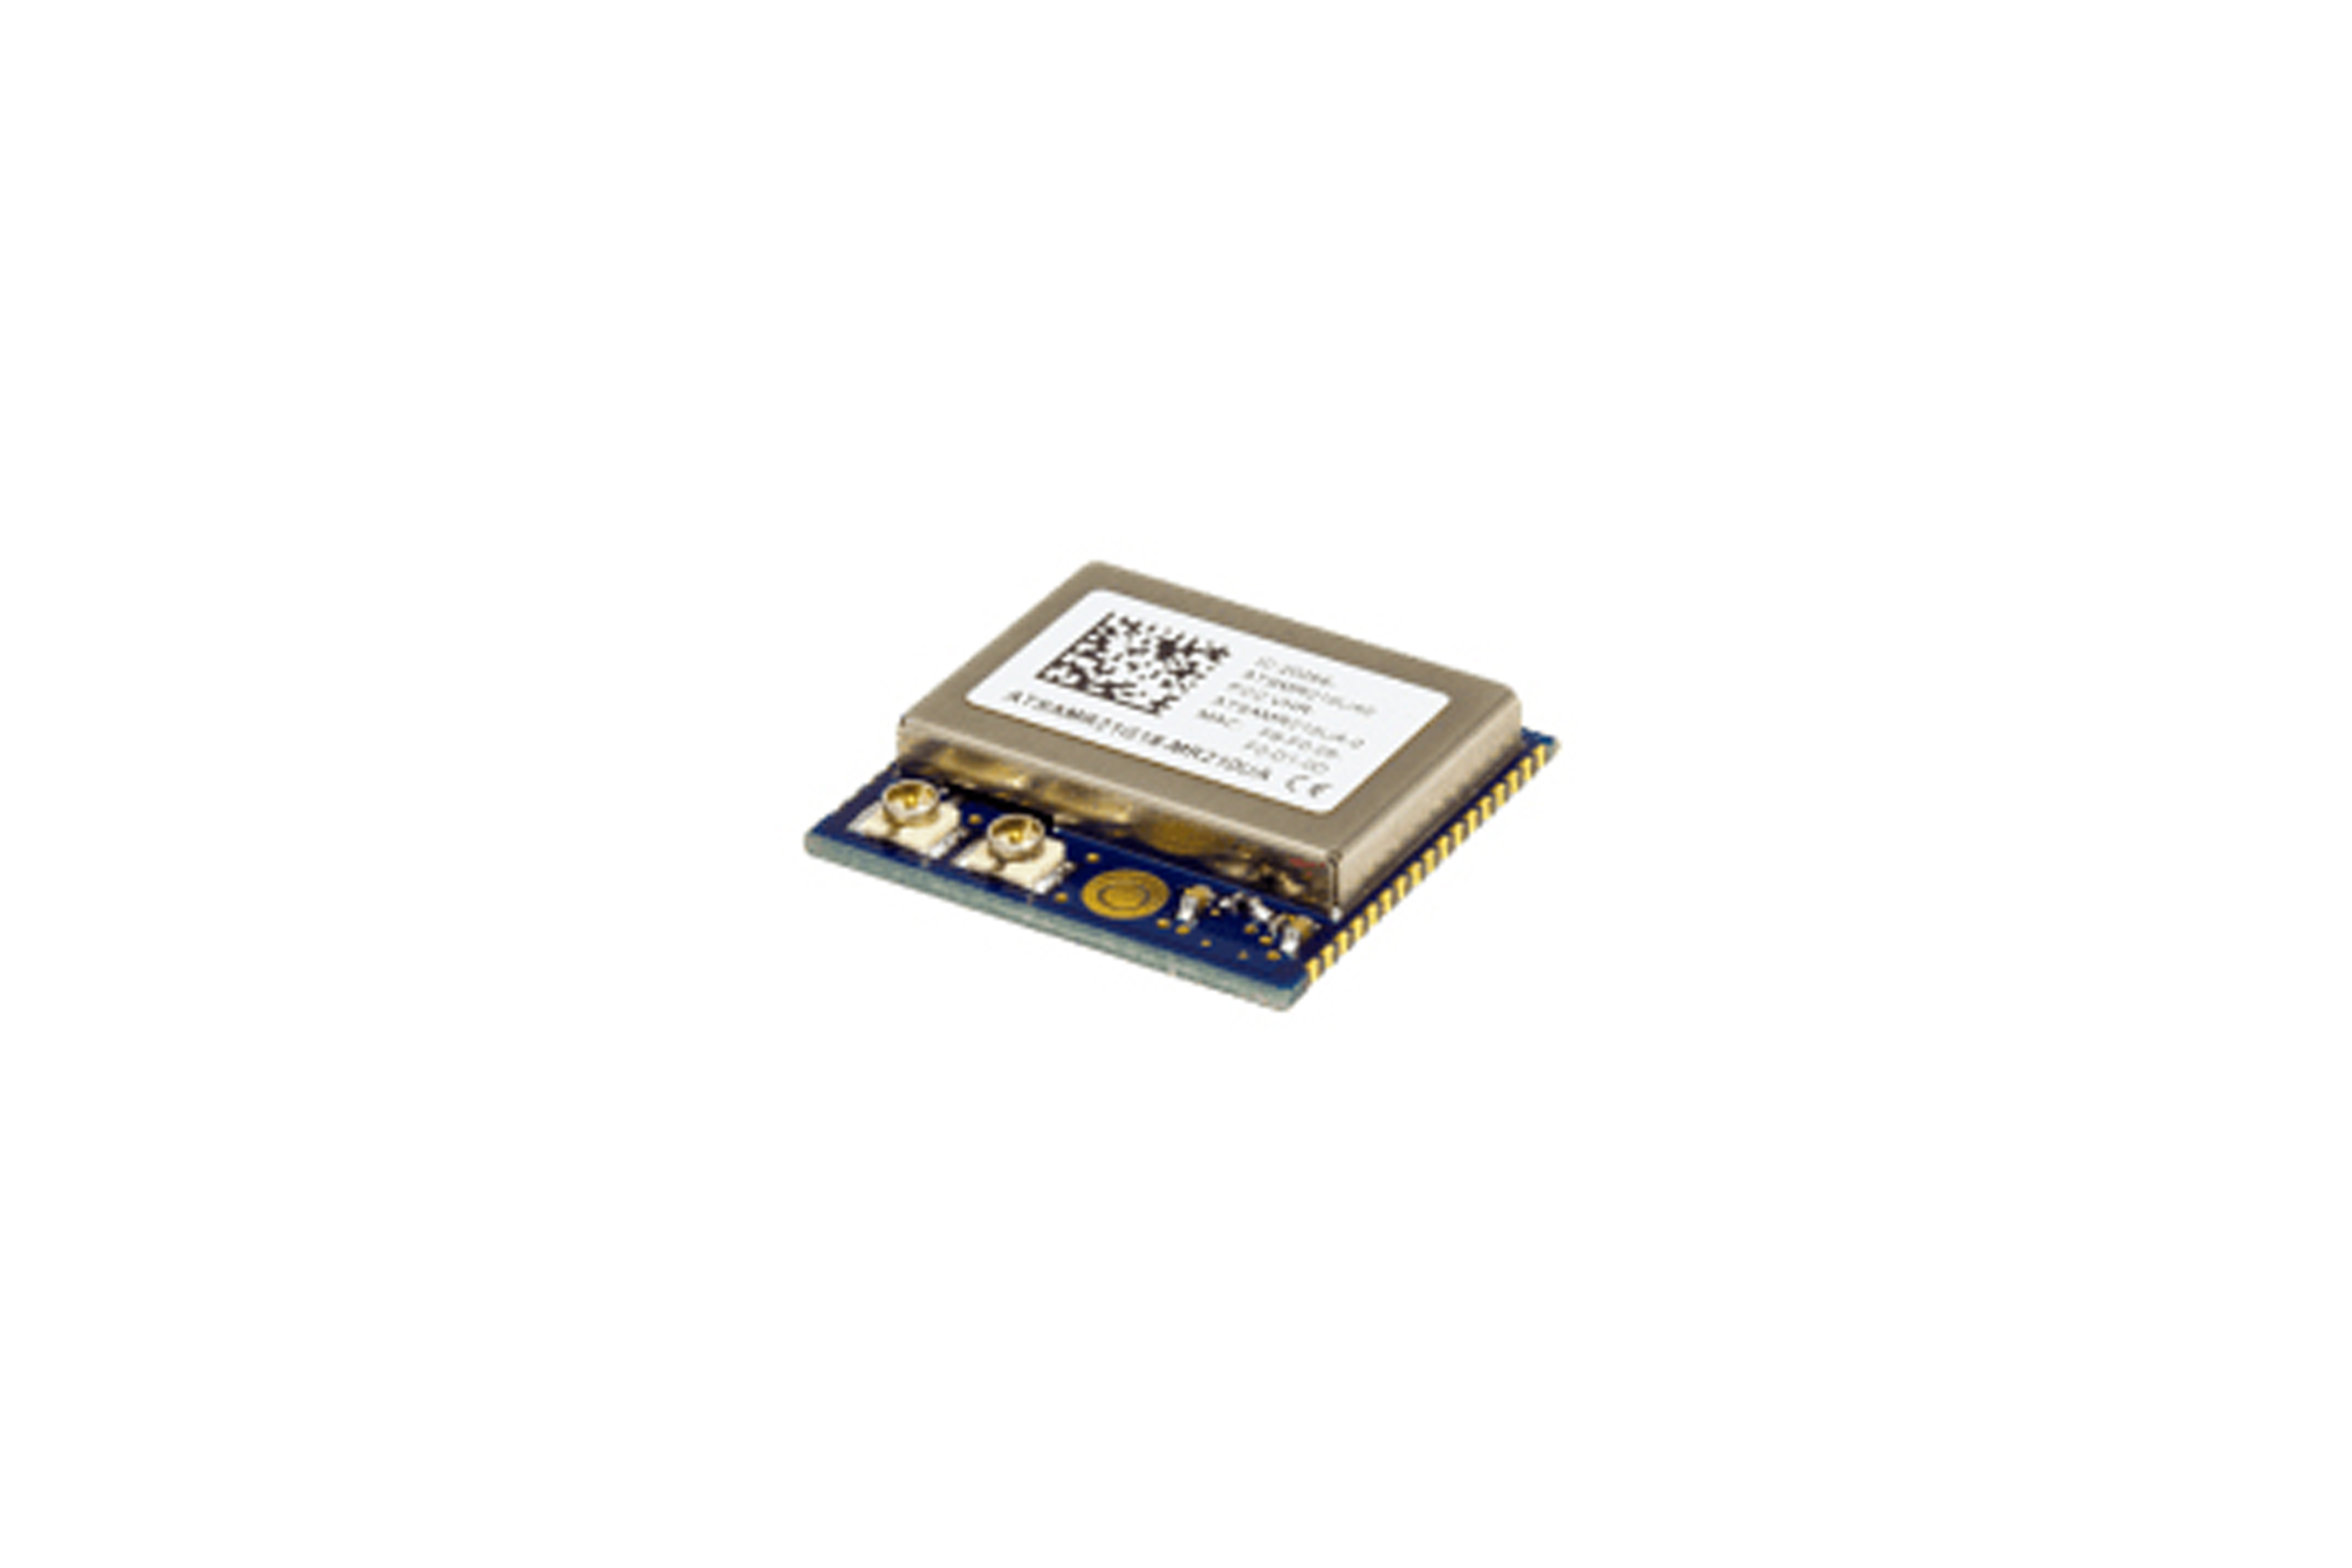 Microchip ATSAMR21G18 Sistema IEEE 802.15.4 SOC per ZigBee